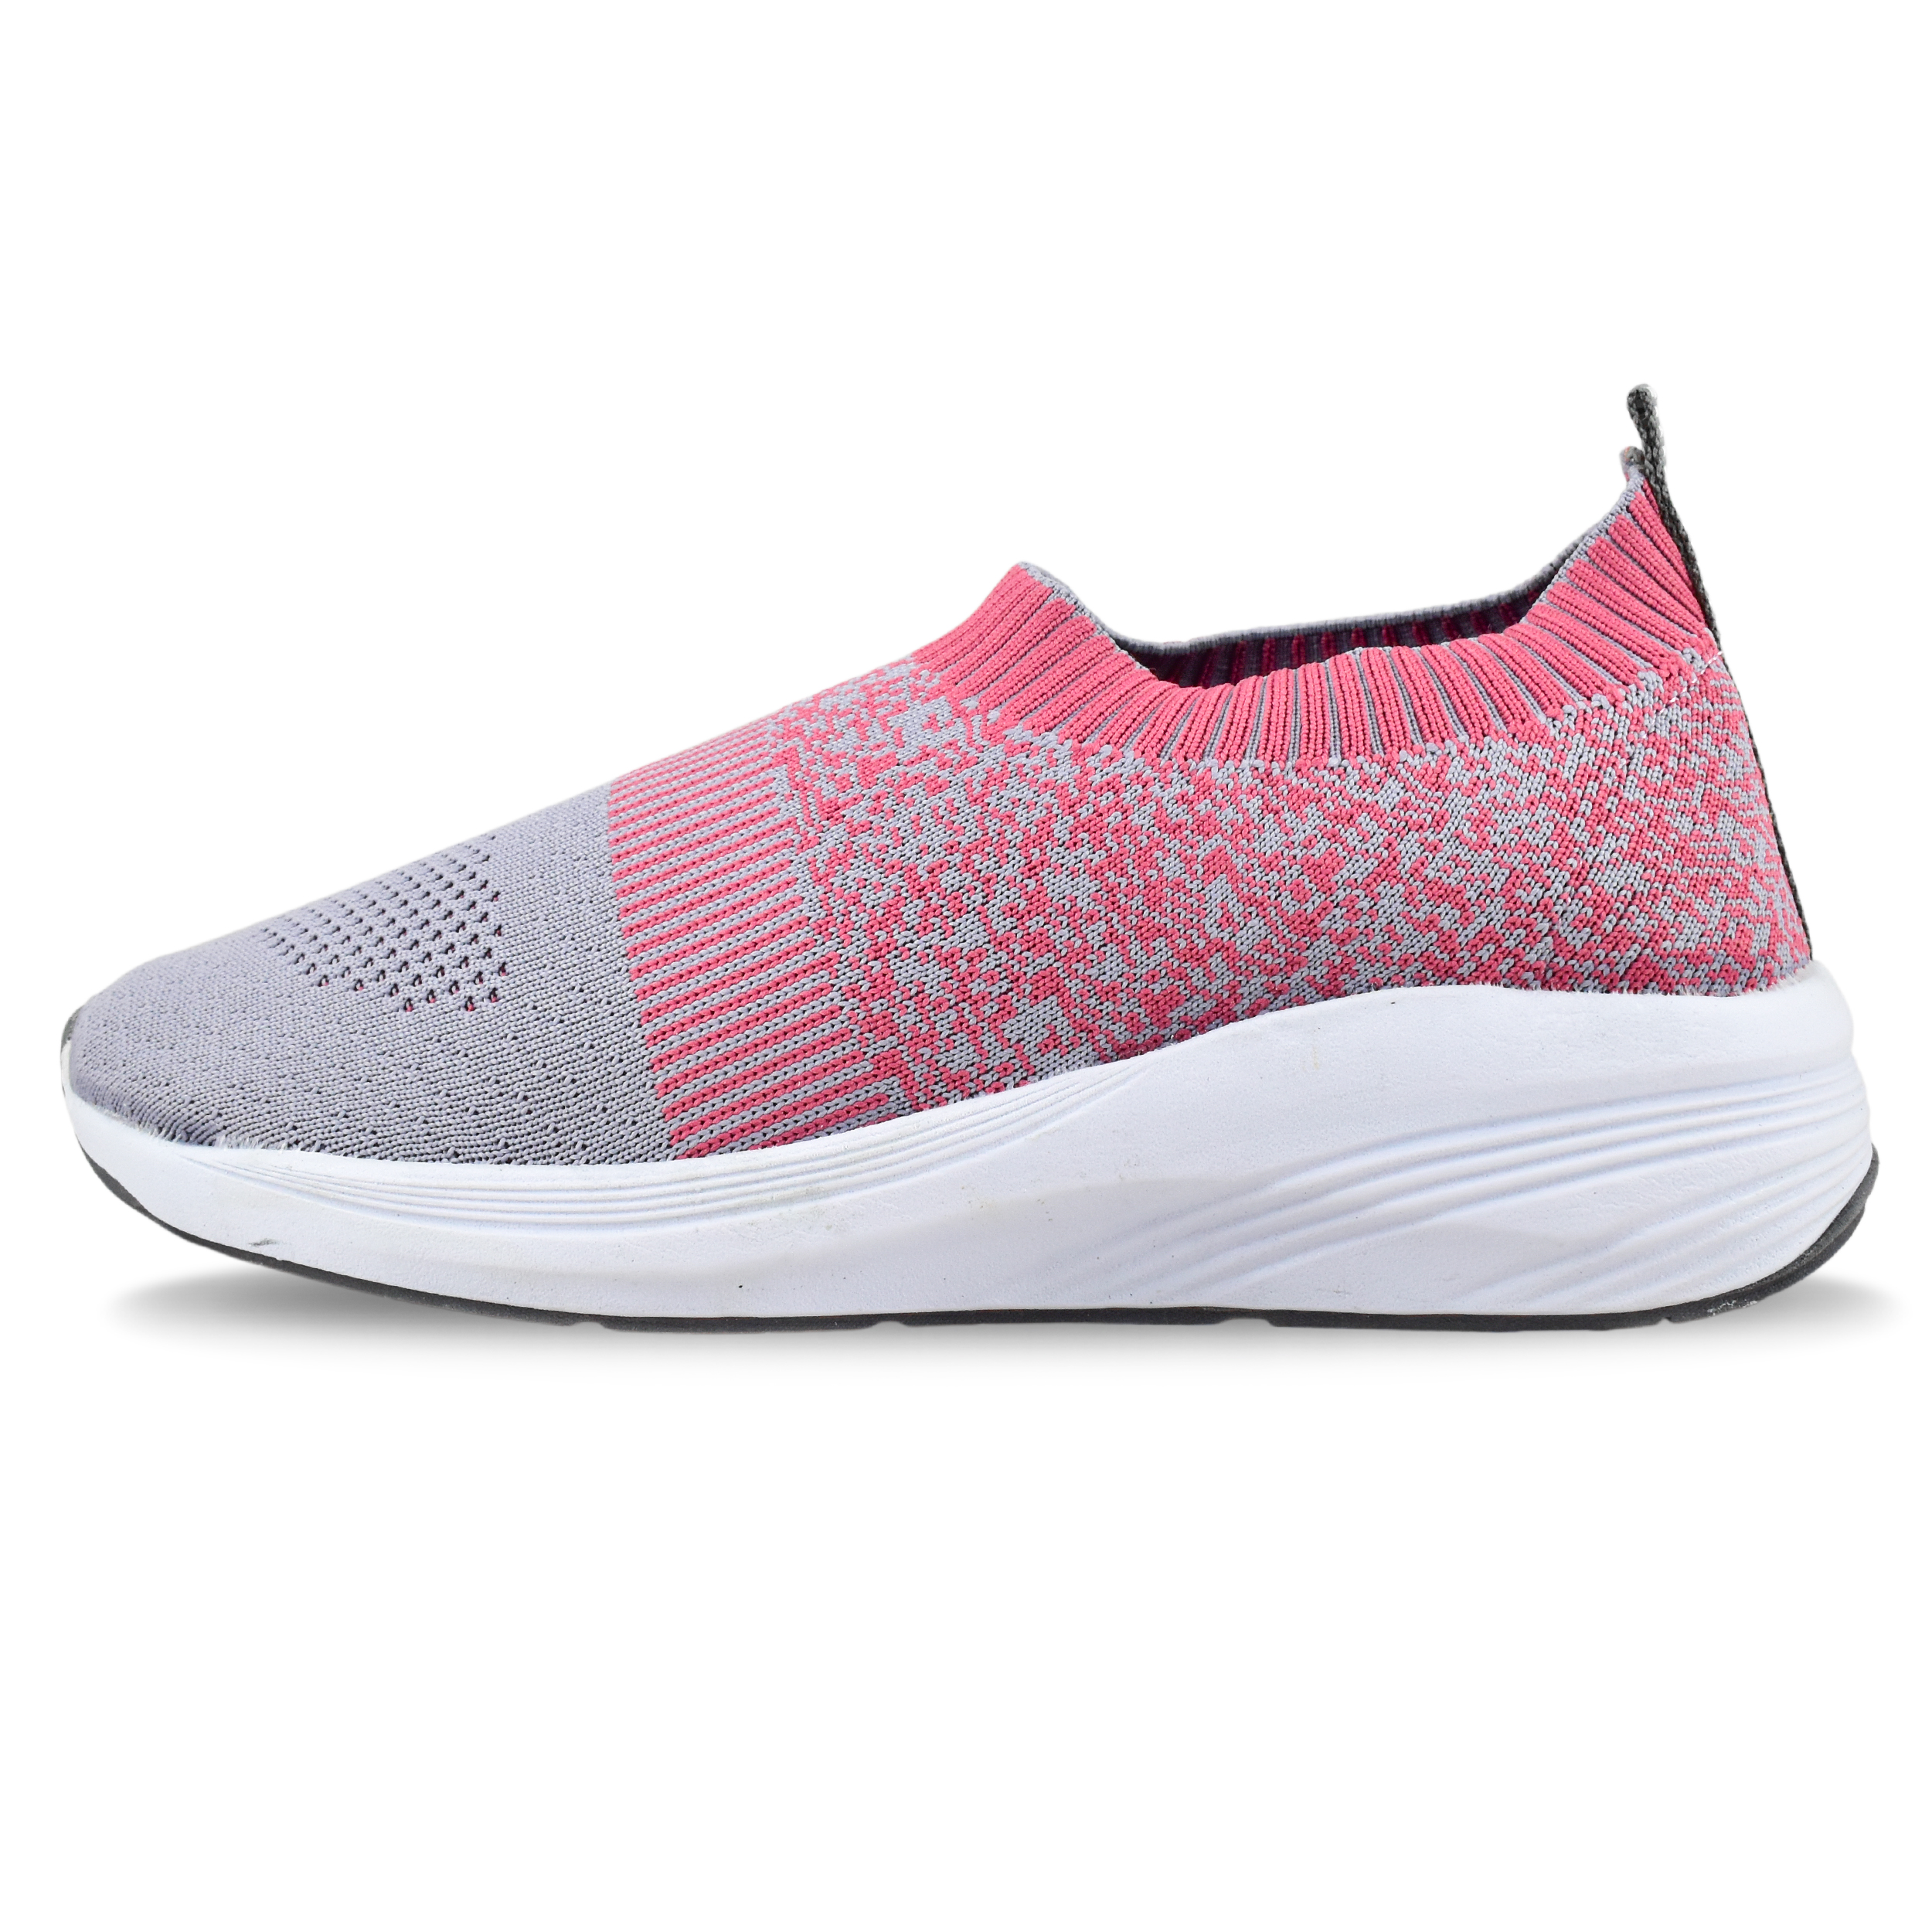 کفش مخصوص پیاده روی زنانه نسیم مدل آرتینا کد 4120